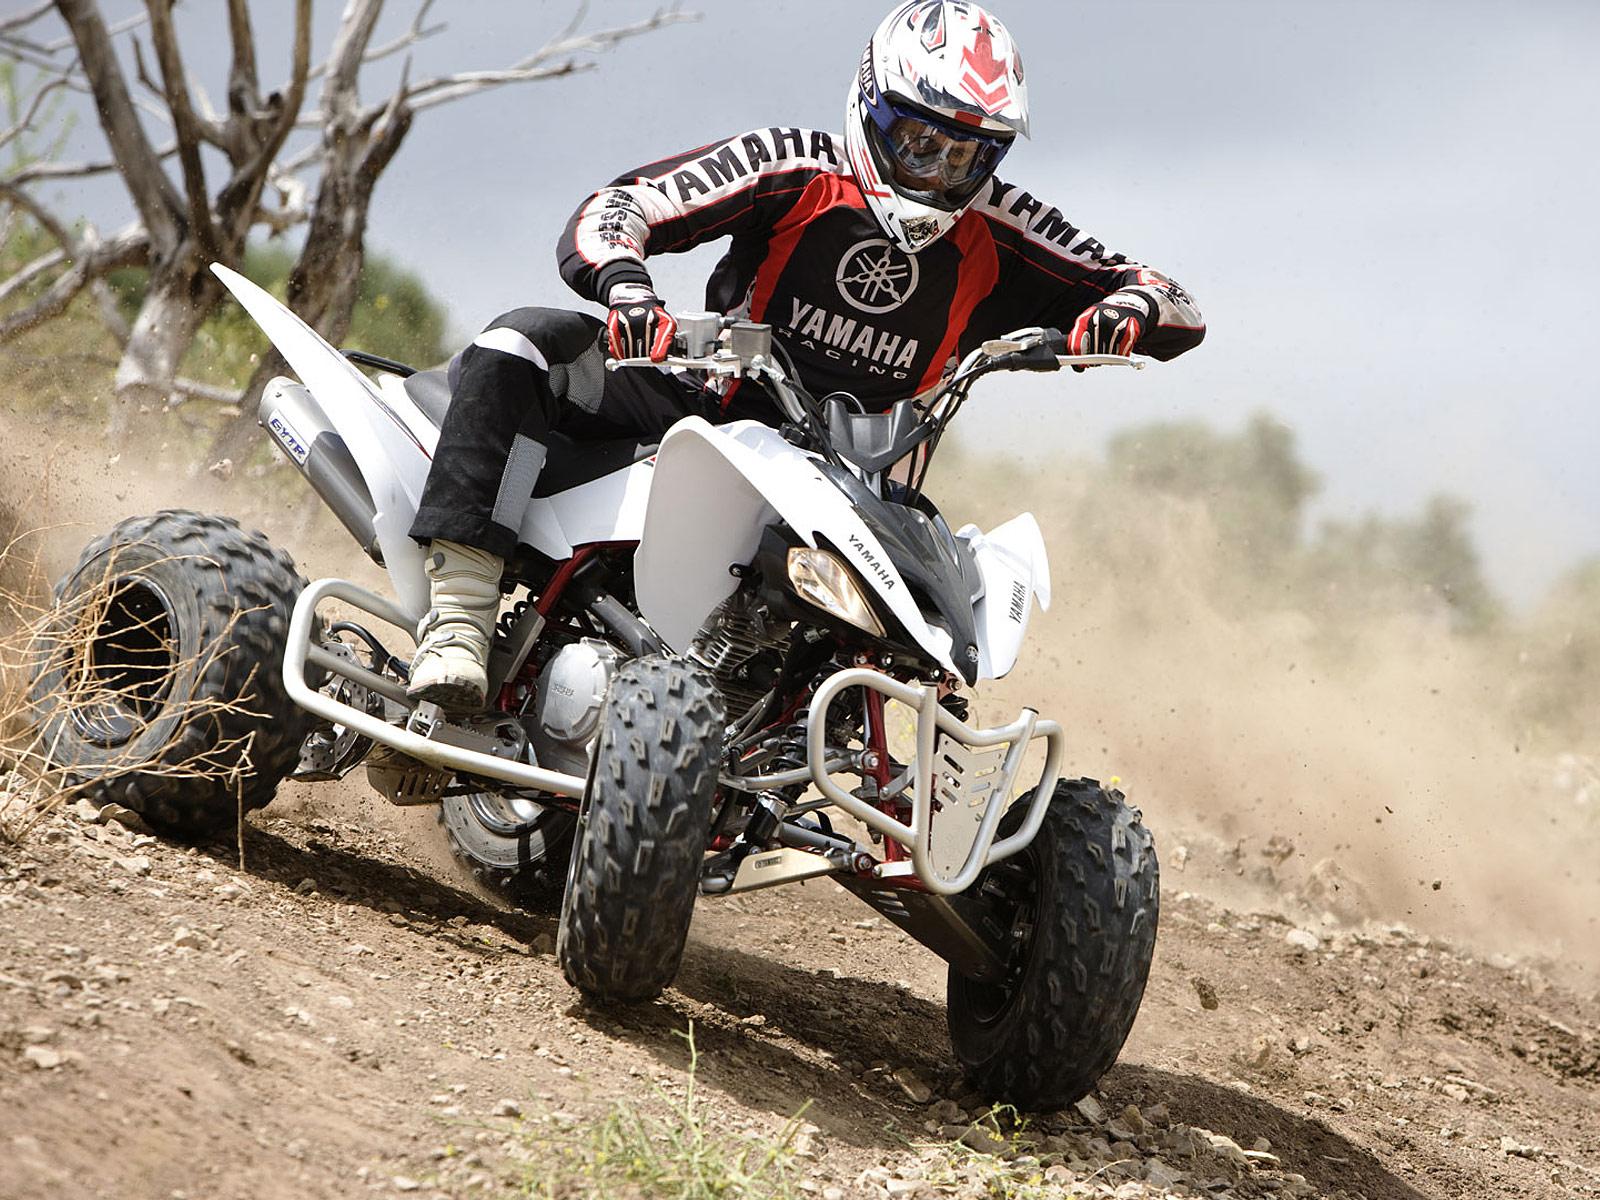 2009 YAMAHA pictures Raptor 250 VFM250R atv specifications 1600x1200